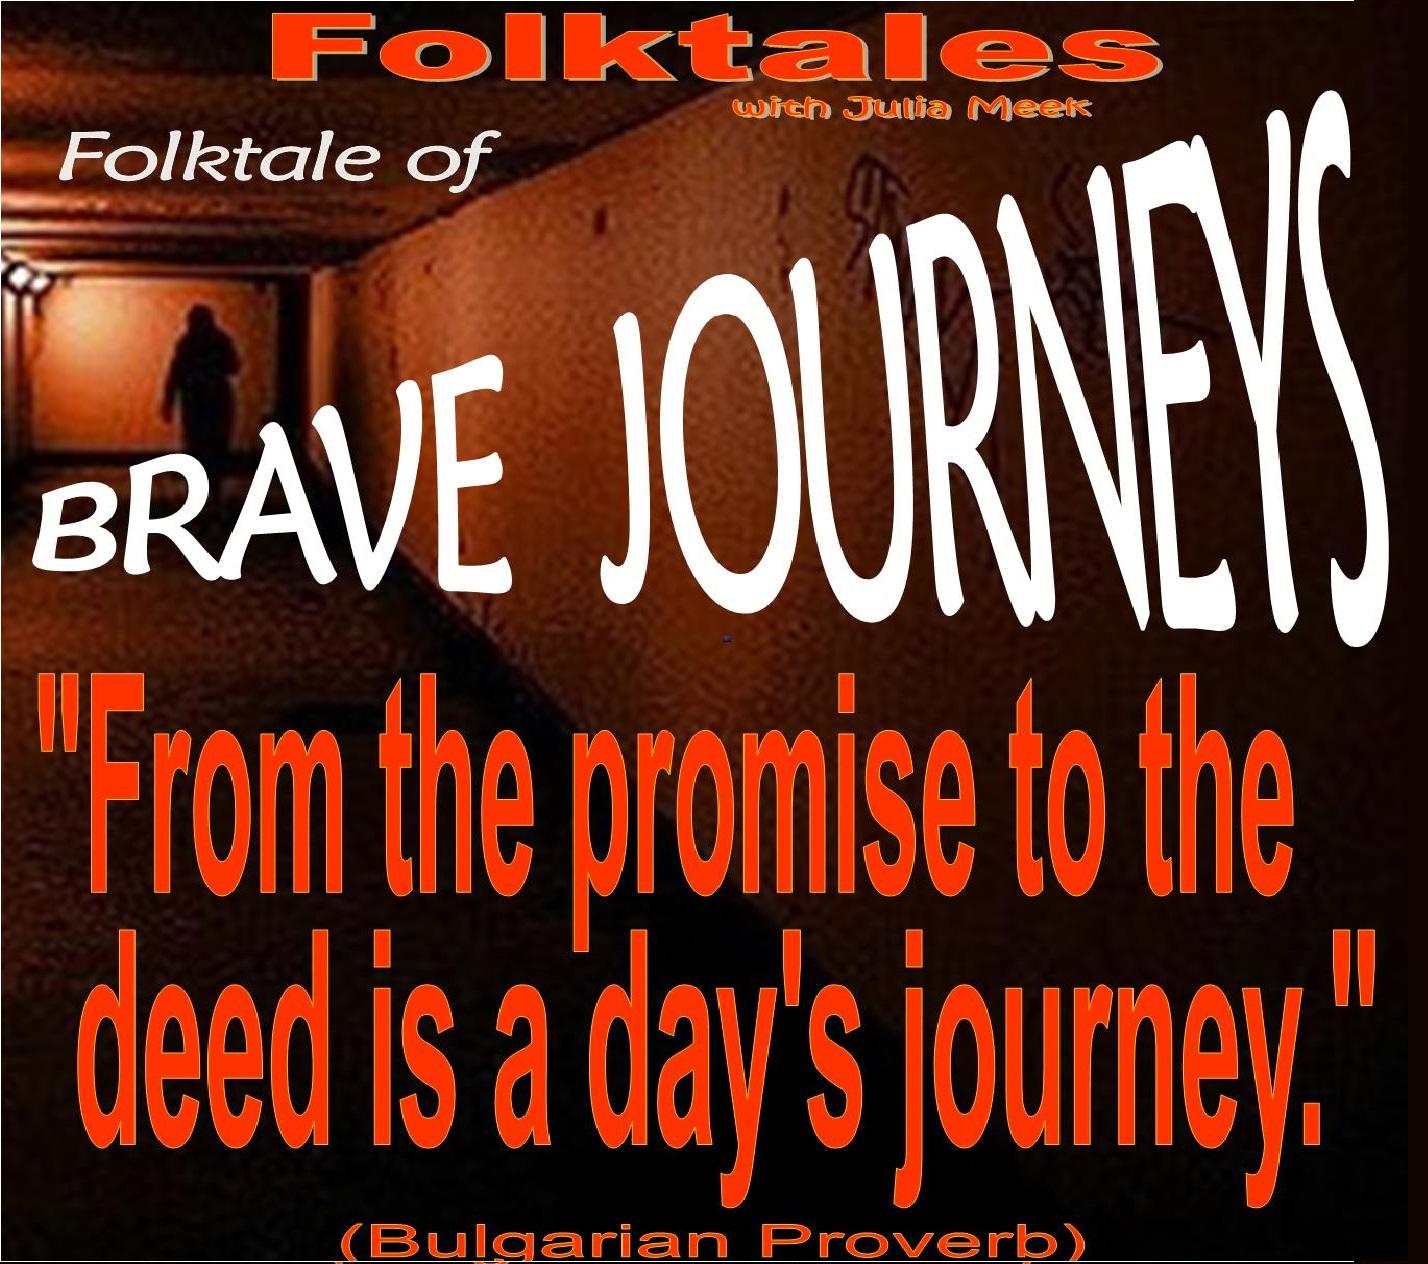 Caption: WBOI's Folktale of Brave Journeys, Credit: Julia Meek